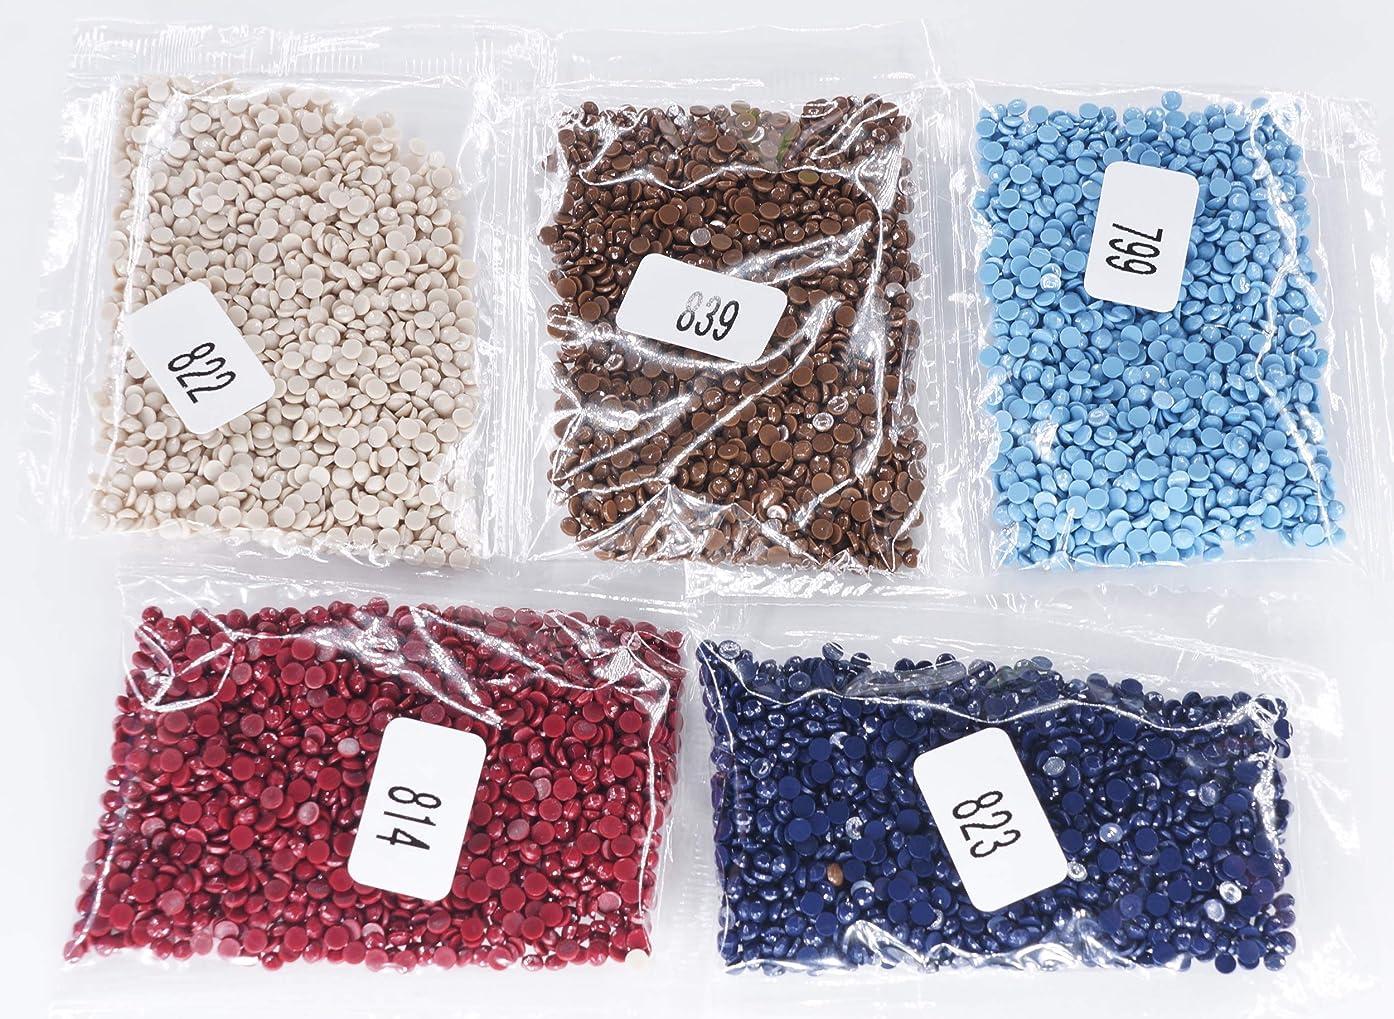 KOTART Diamond Painting Round Diamonds 5 Colour Set Replacement Rhinestones 799 814 822 823 839